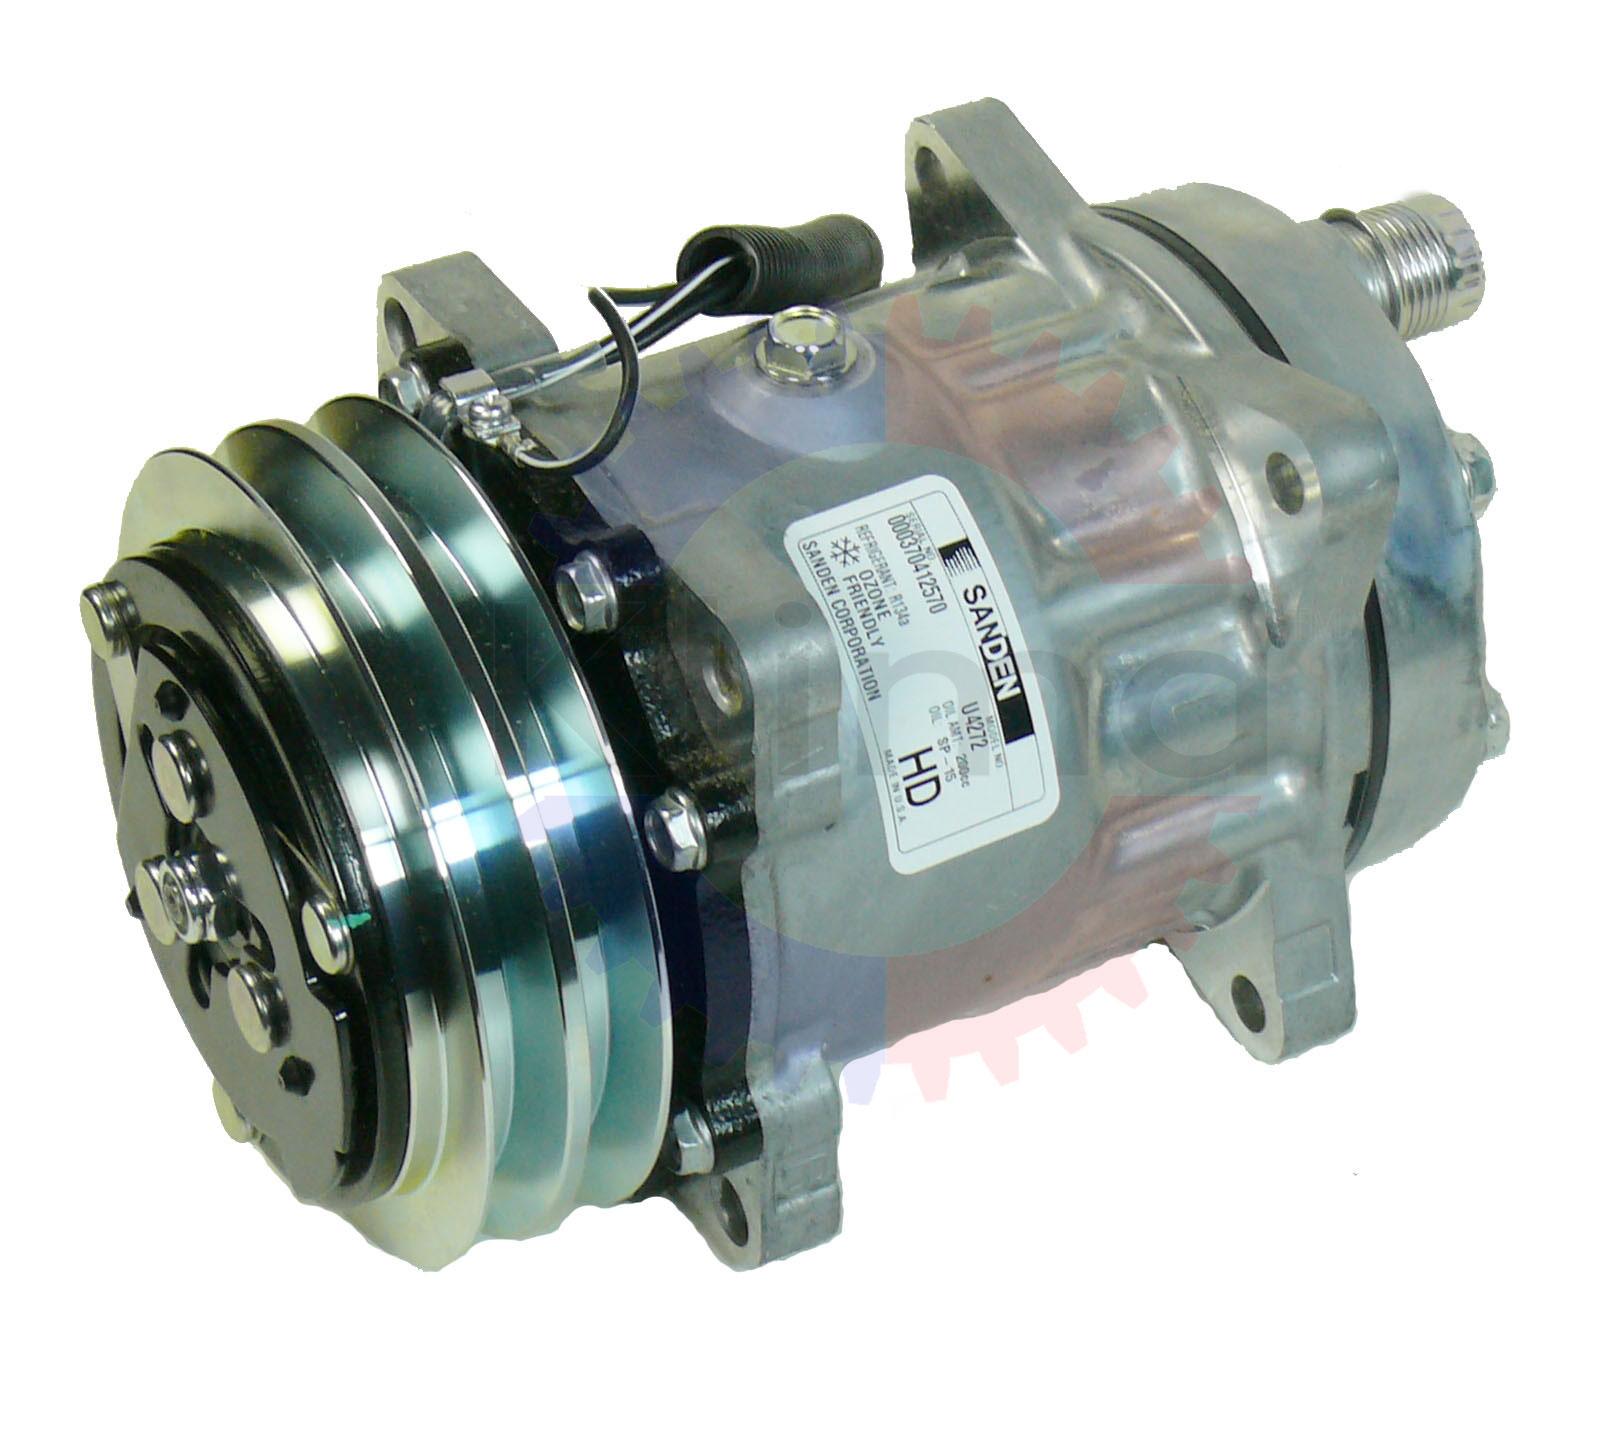 ac compressor dometic fridge wiring diagram klima design works w123 sanden sd a c